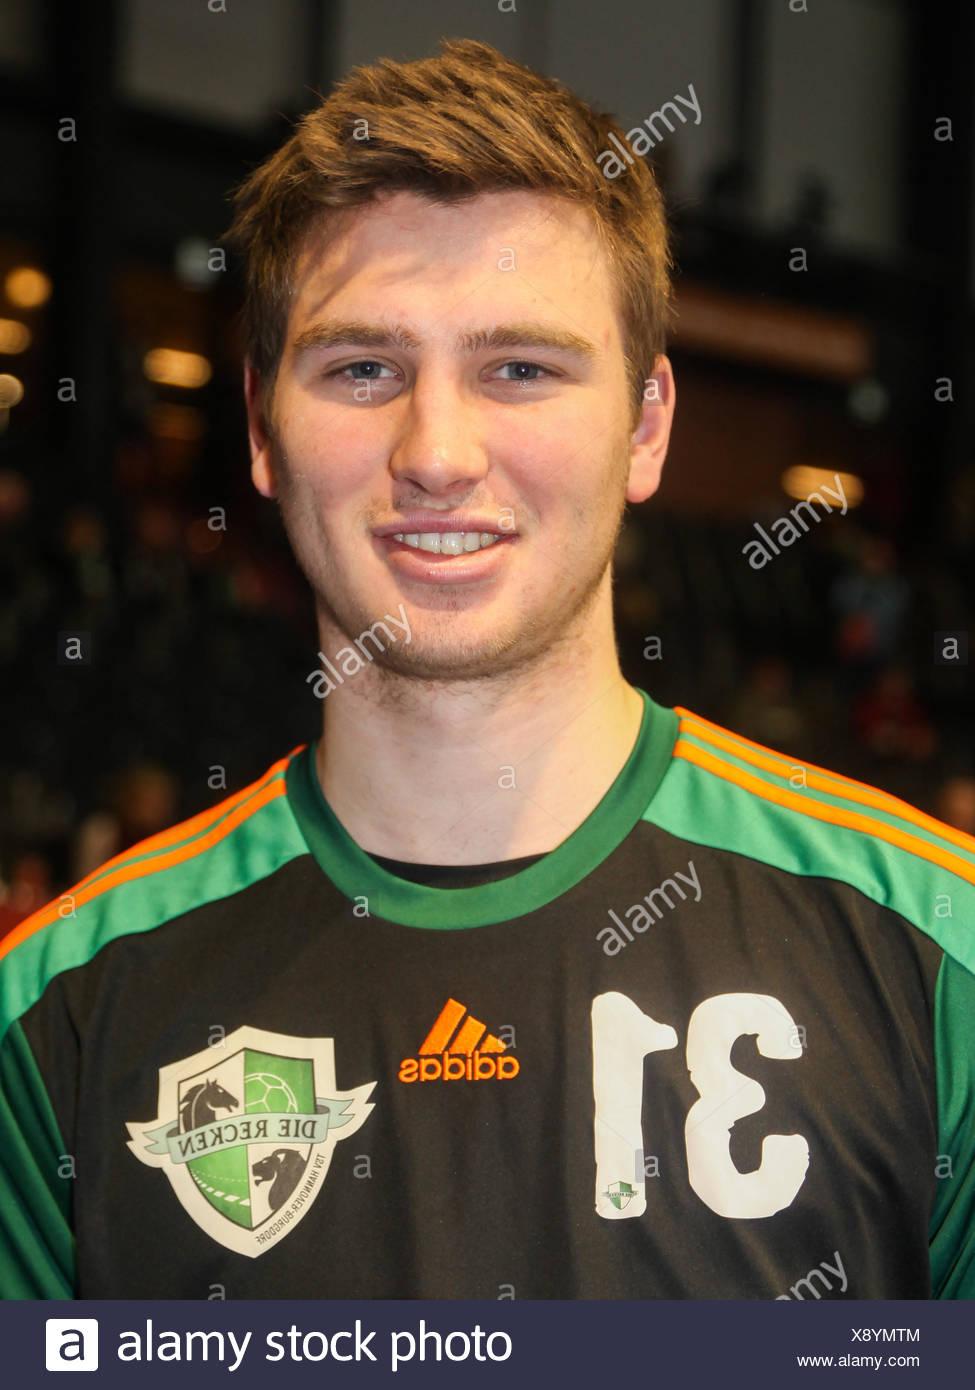 Maurice Dräger (TSV Hannover-Burgdorf) Stock Photo